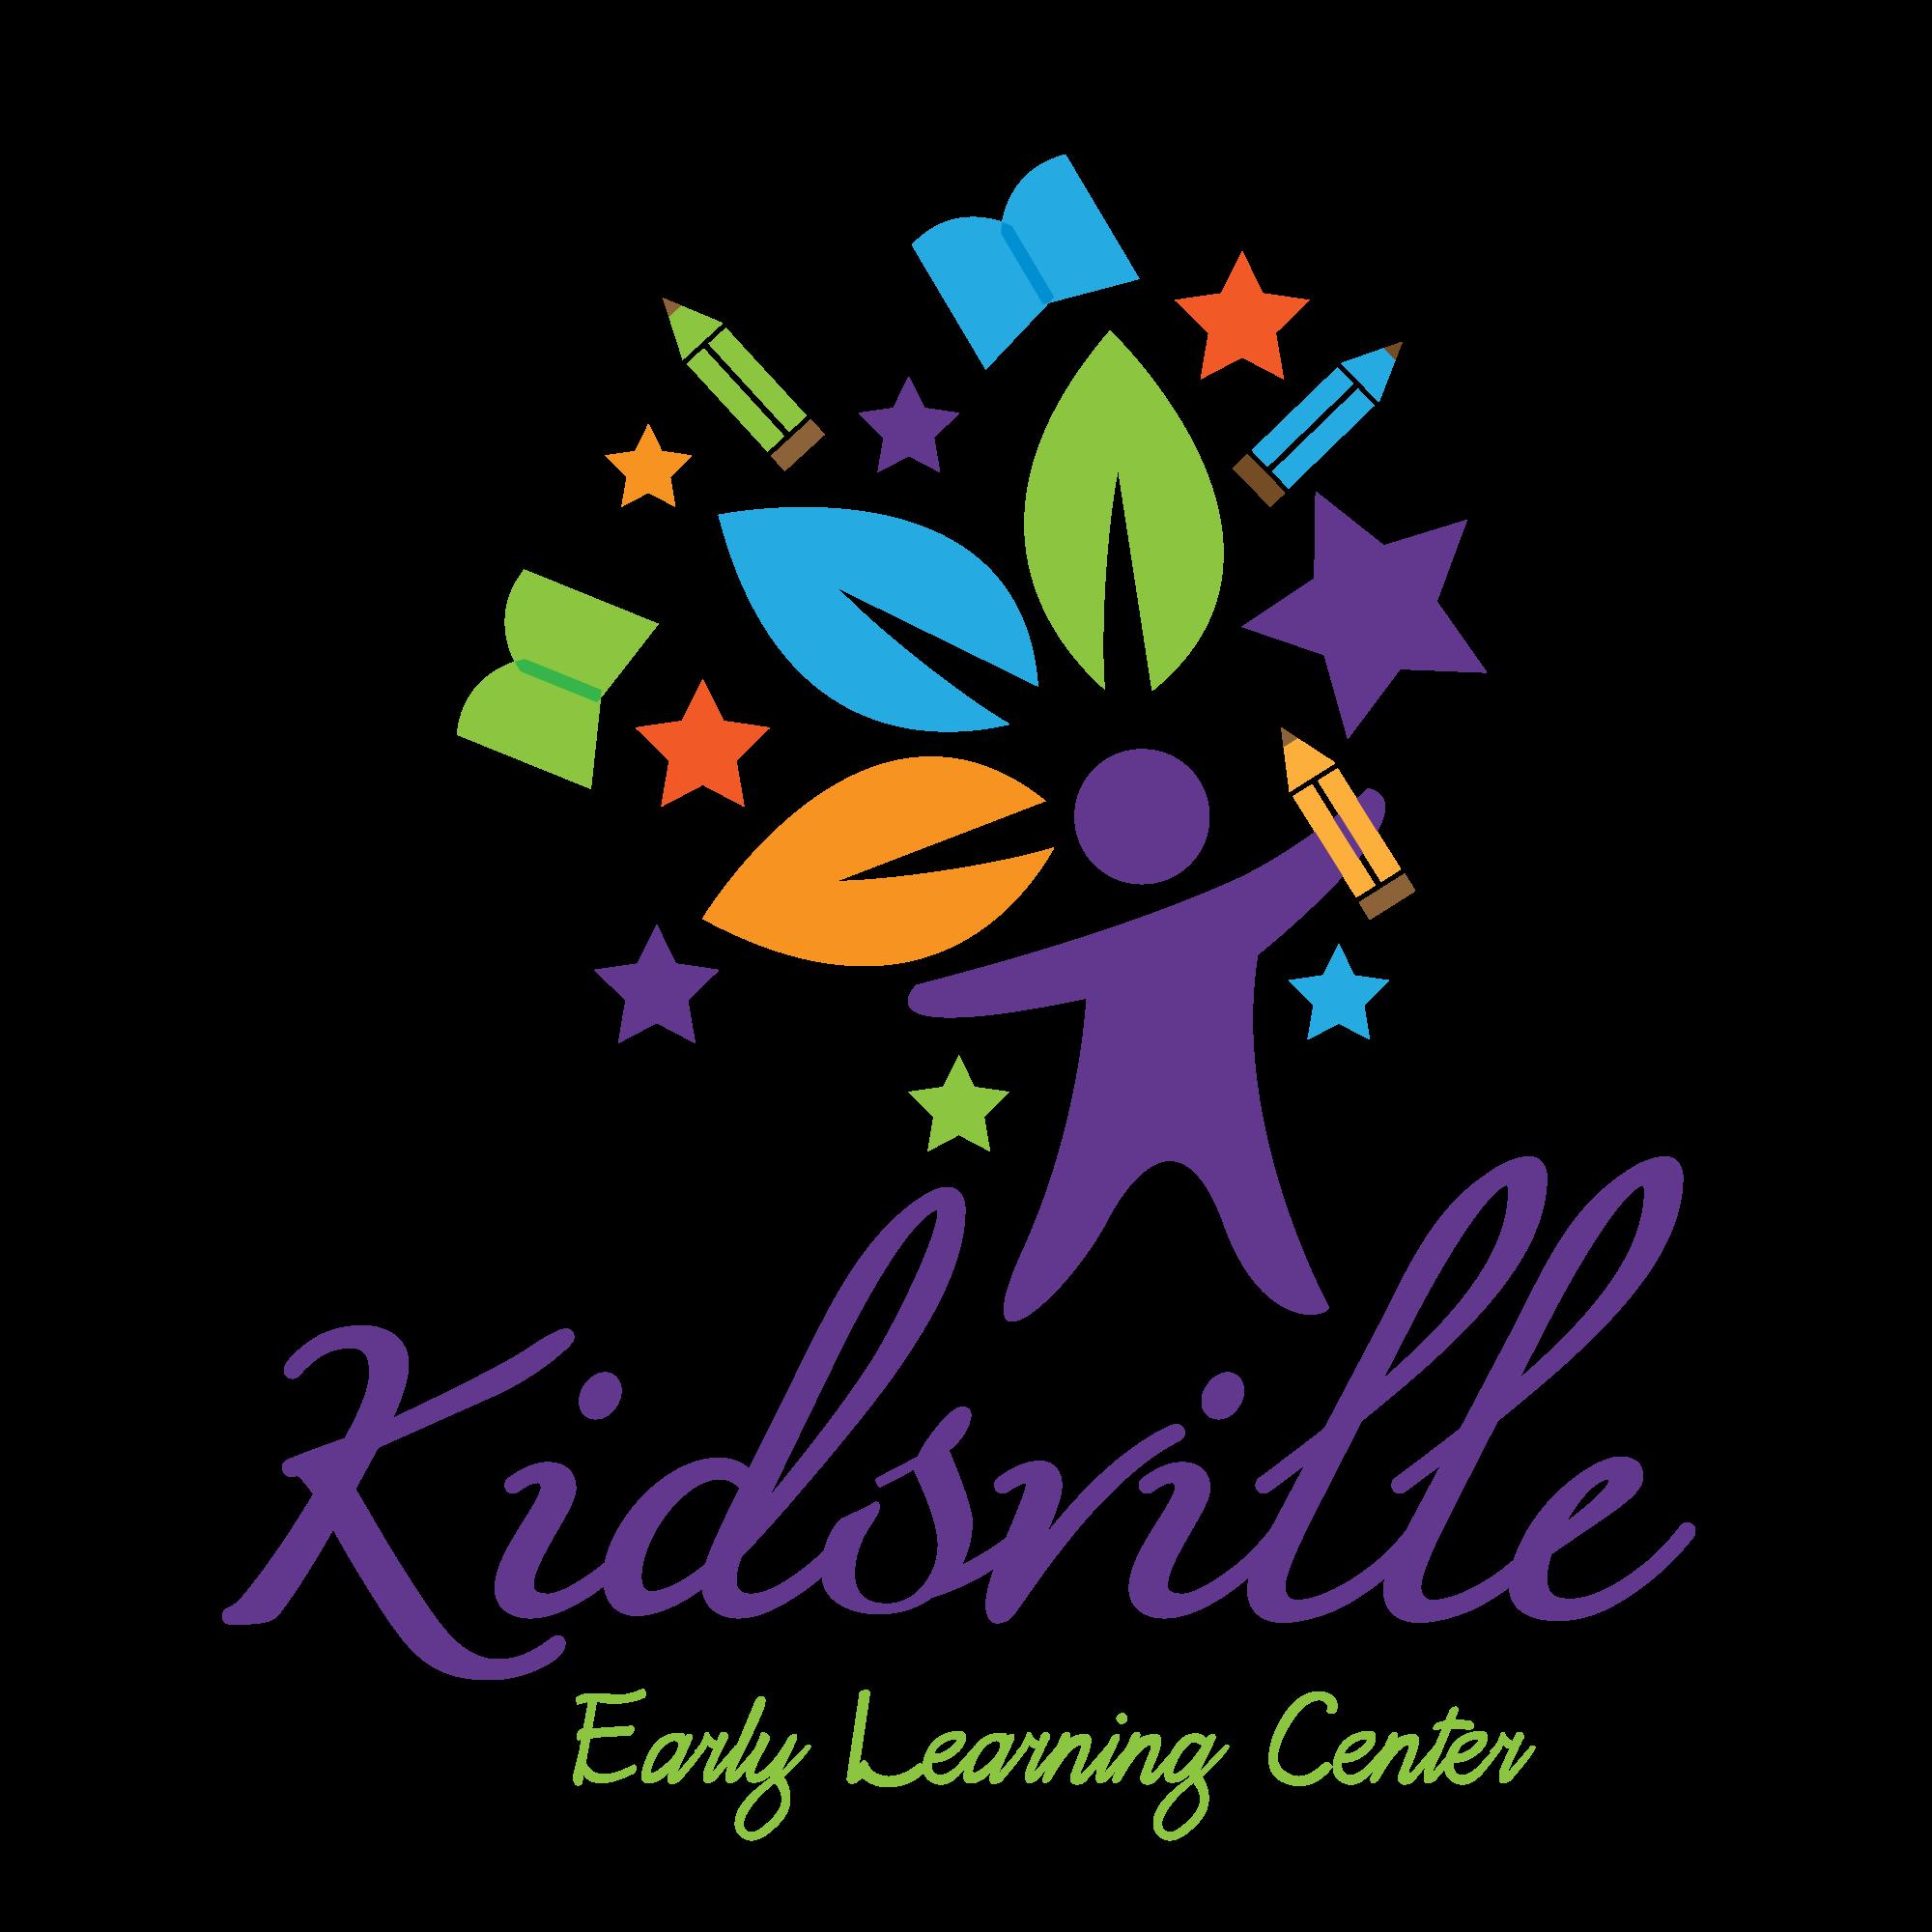 kidsville logo